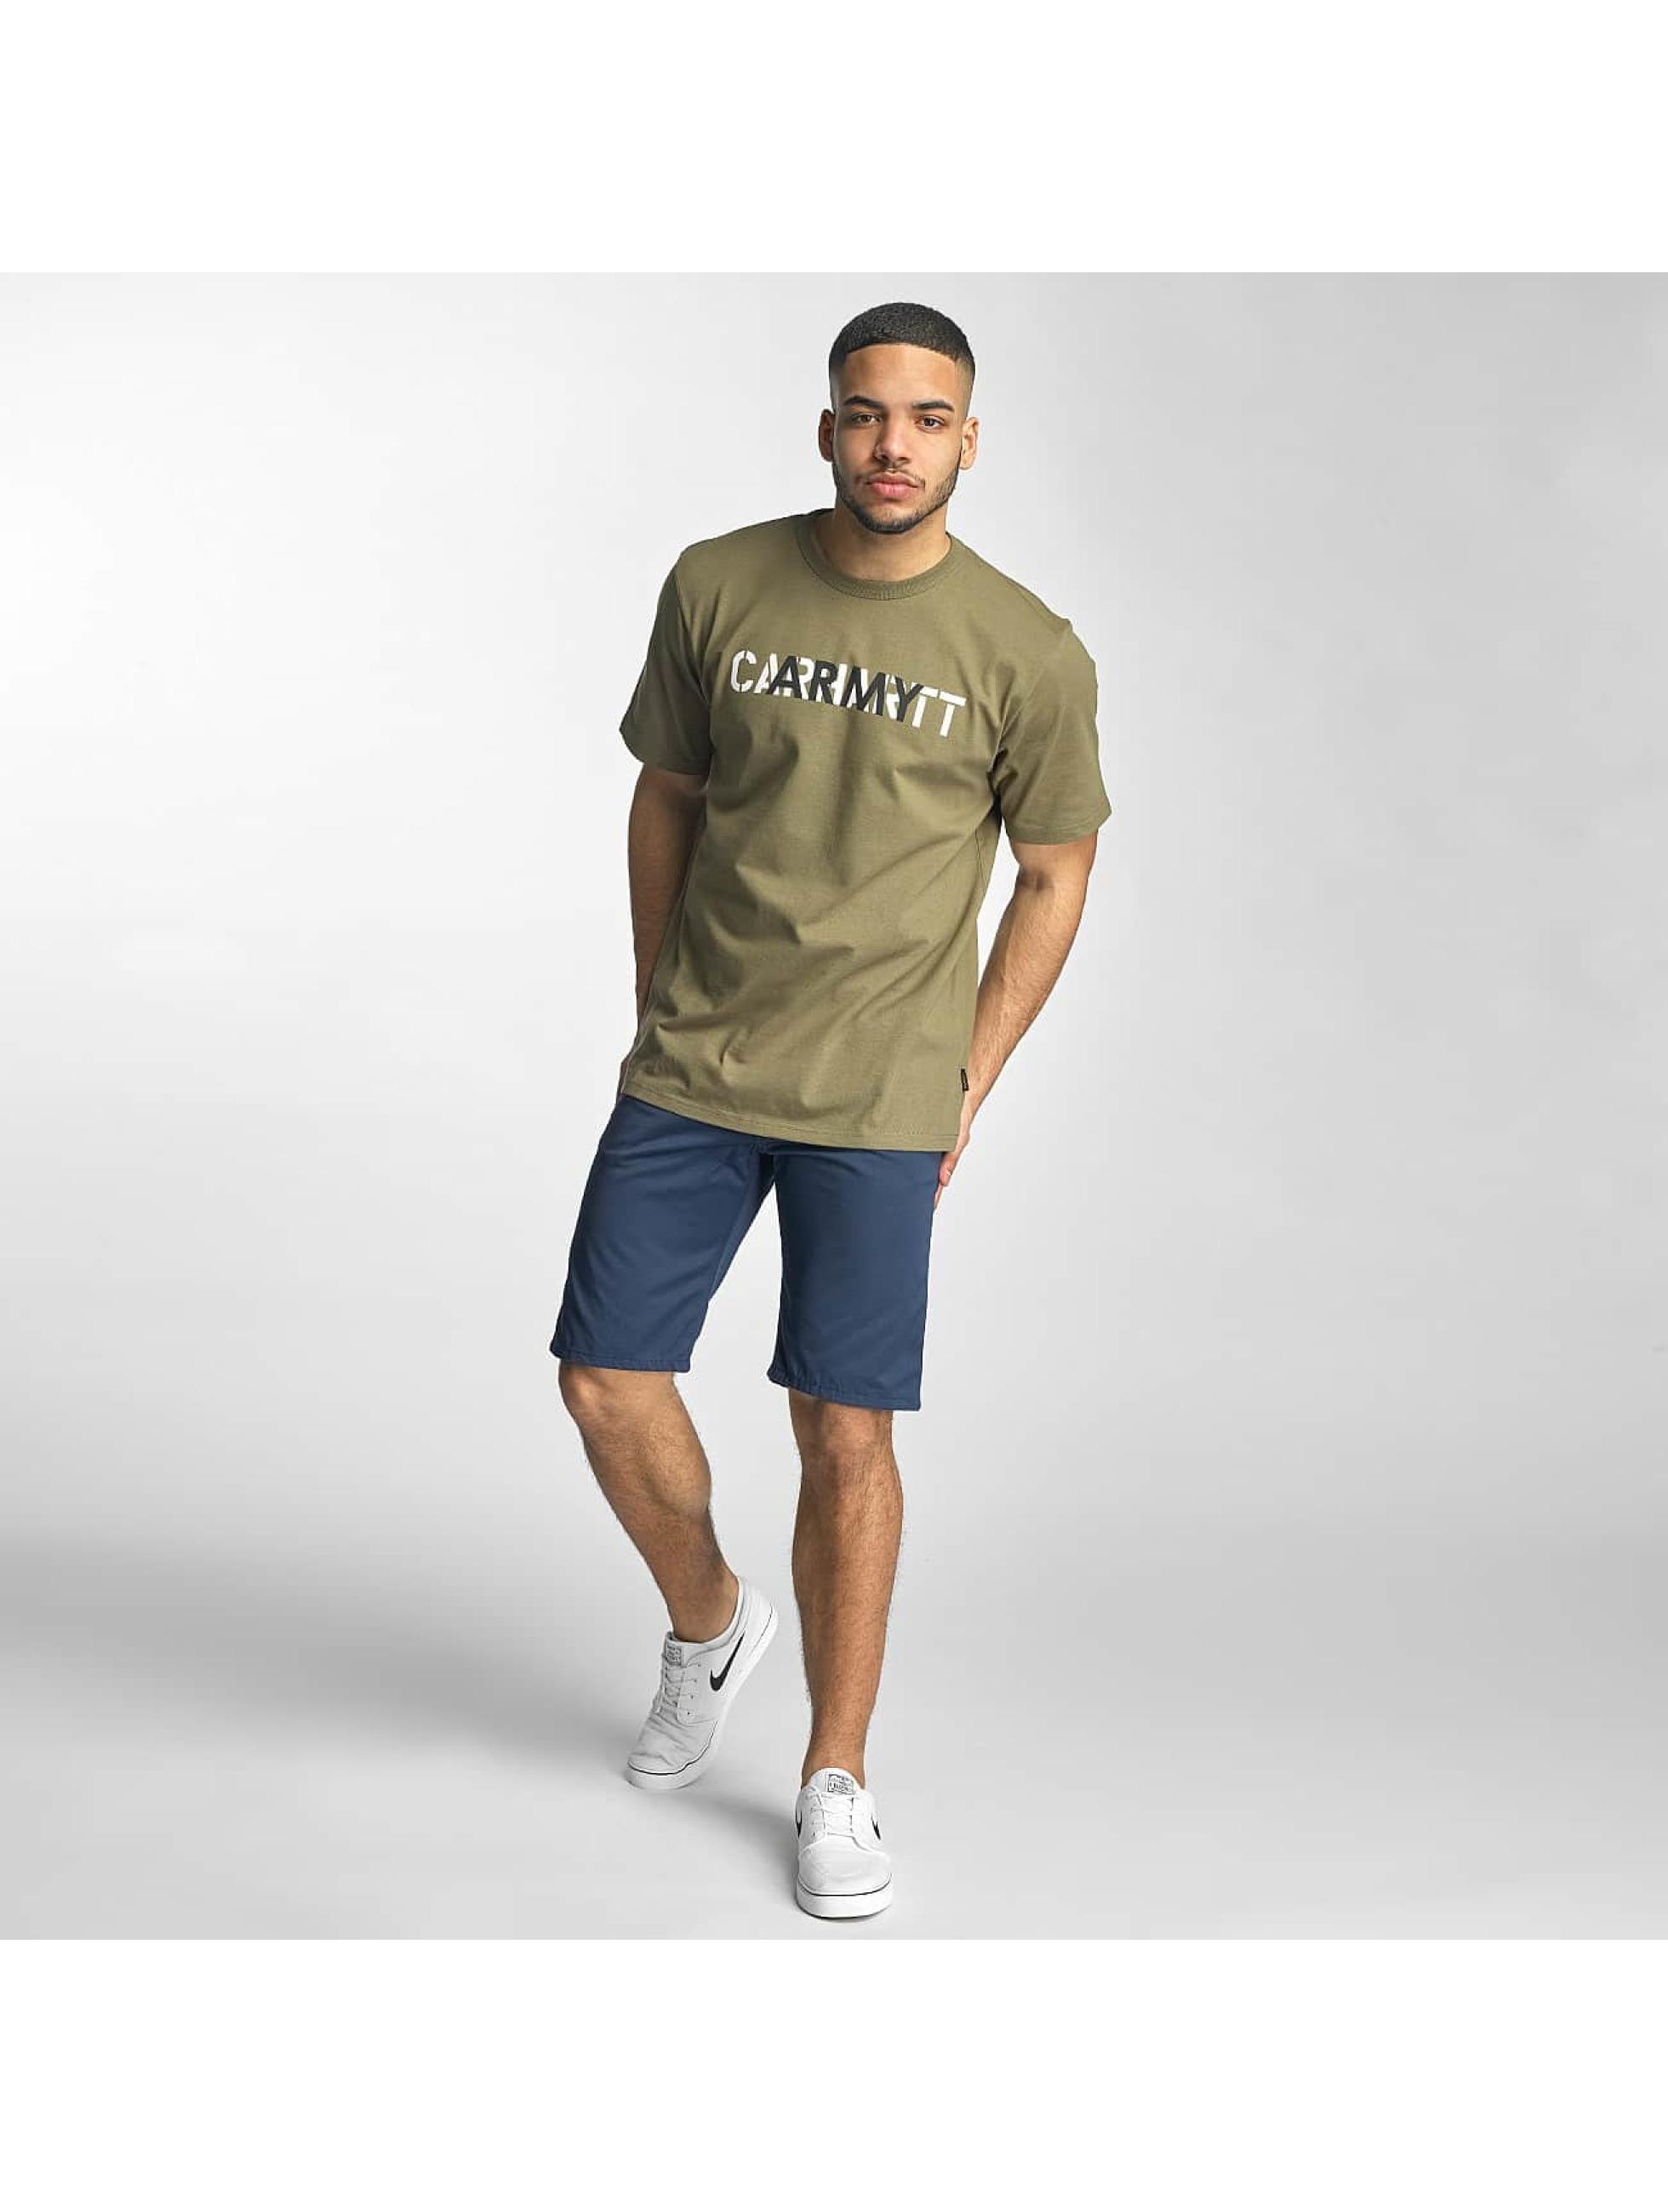 Carhartt WIP T-Shirt S/S CA Training green